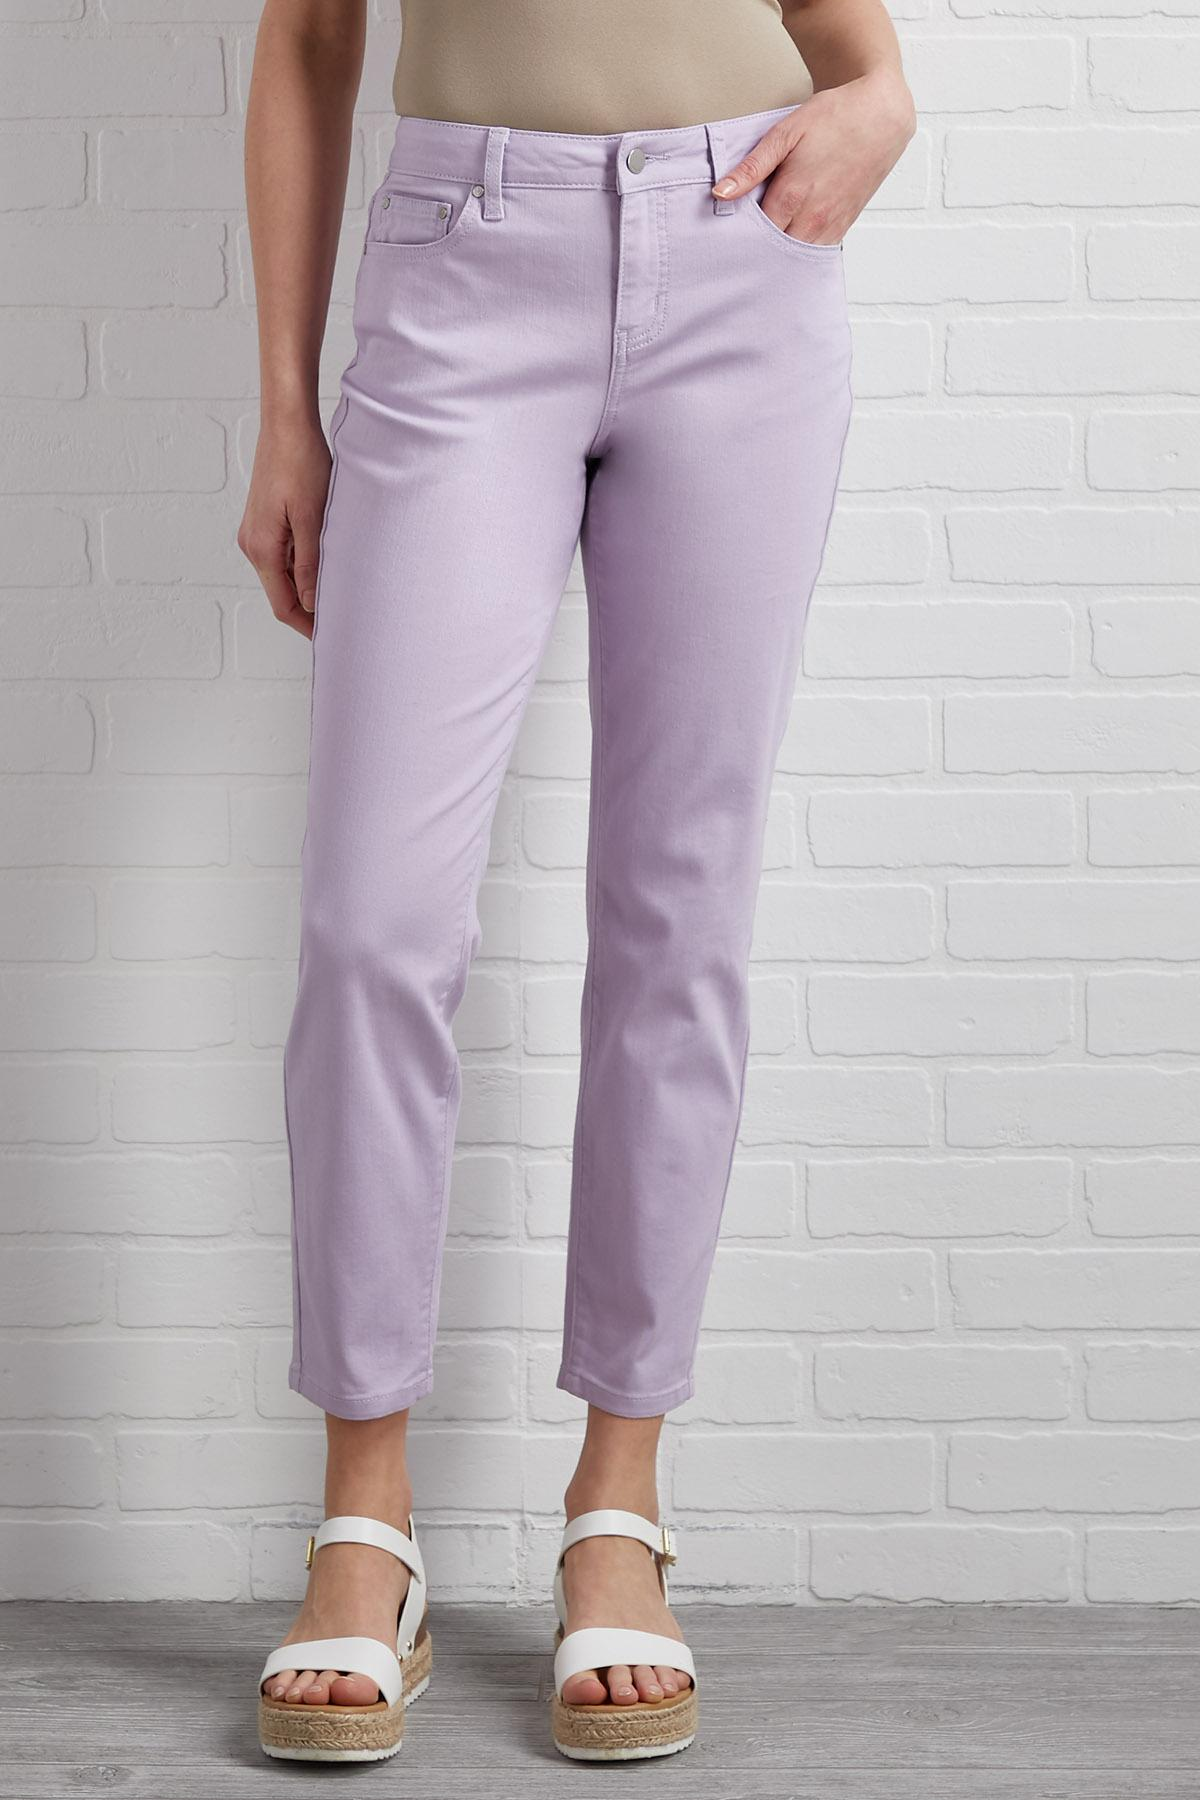 I Really Lilac You Pants